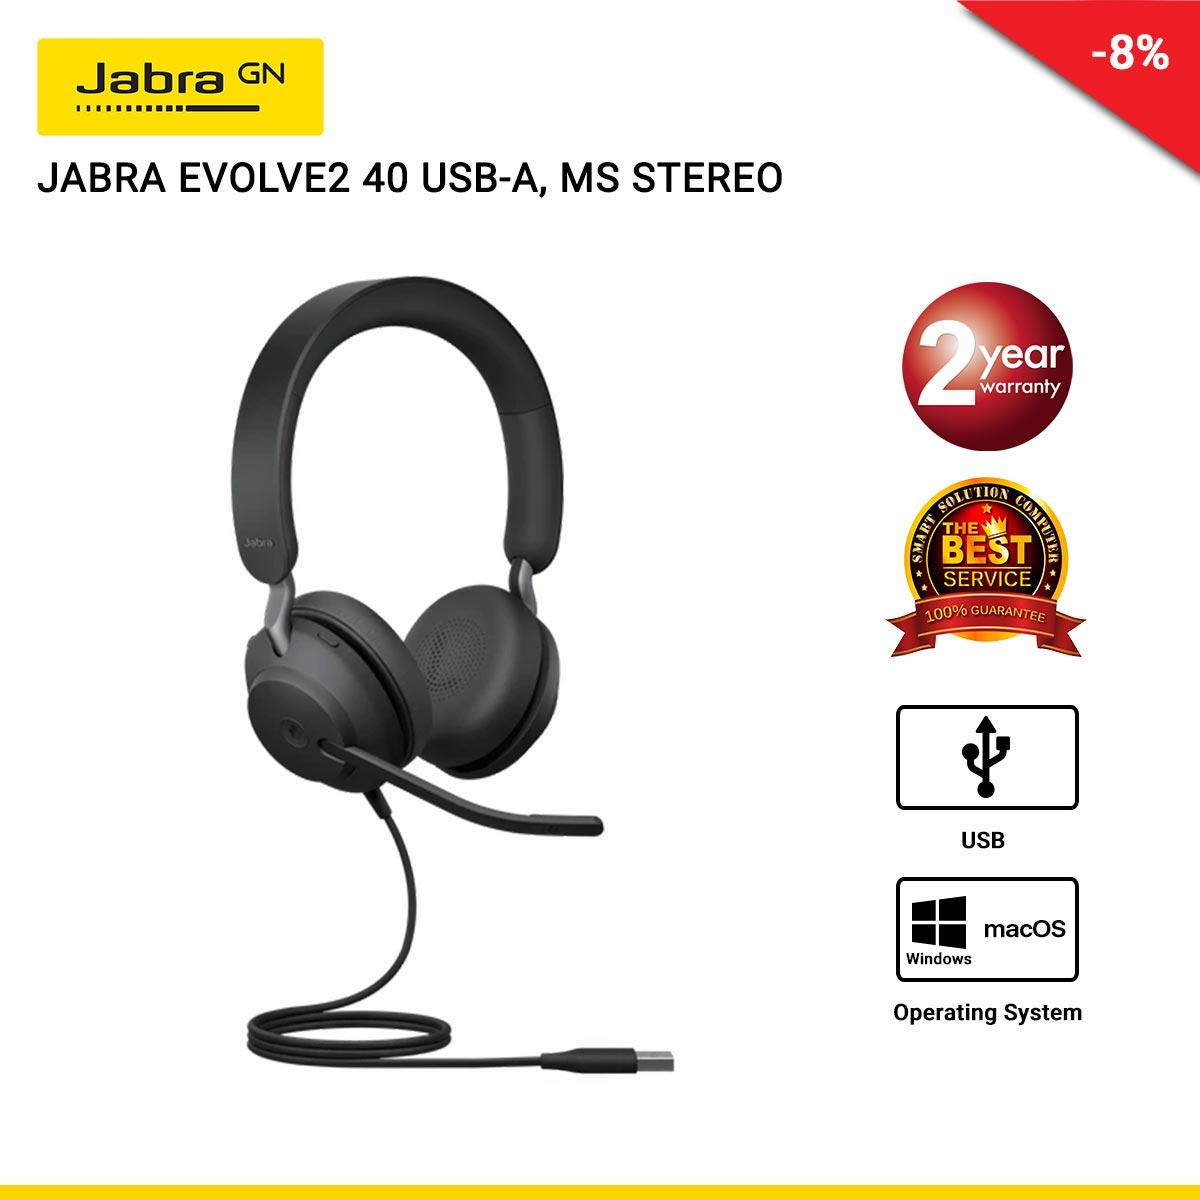 JABRA EVOLVE2 40 USB-A, MS STEREO (JBA-24089-999-999)